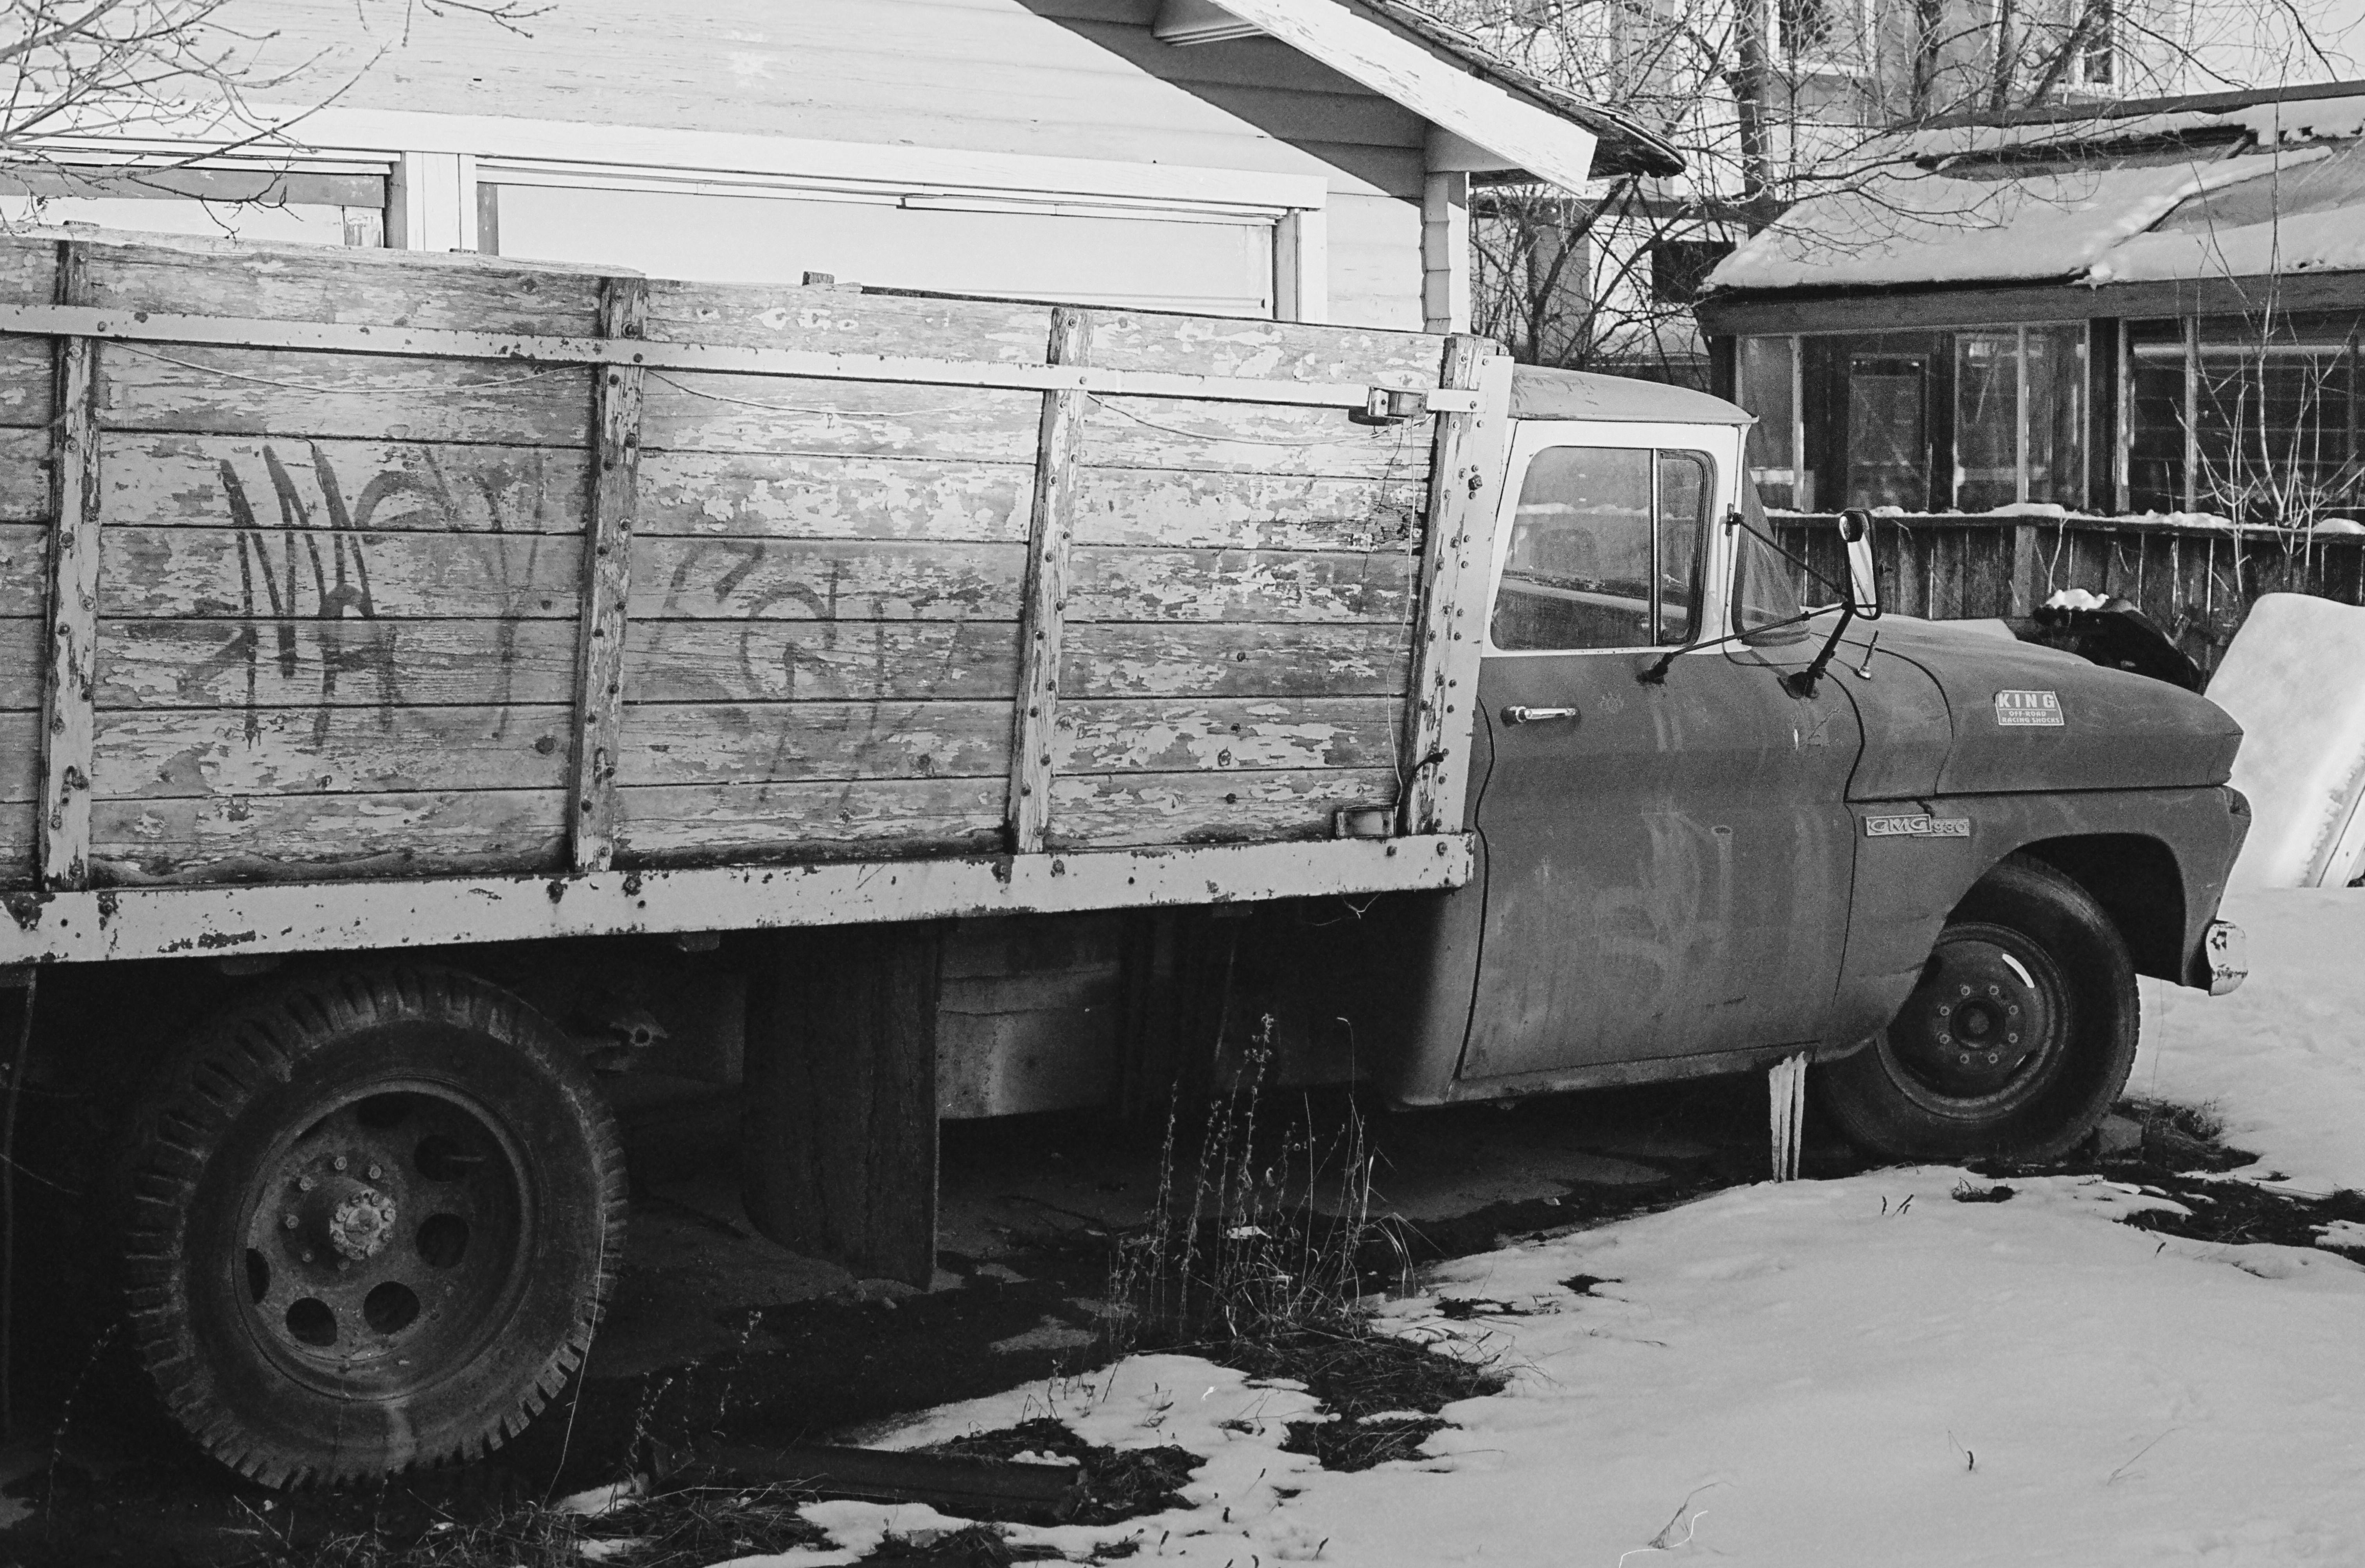 Abandoned Truck